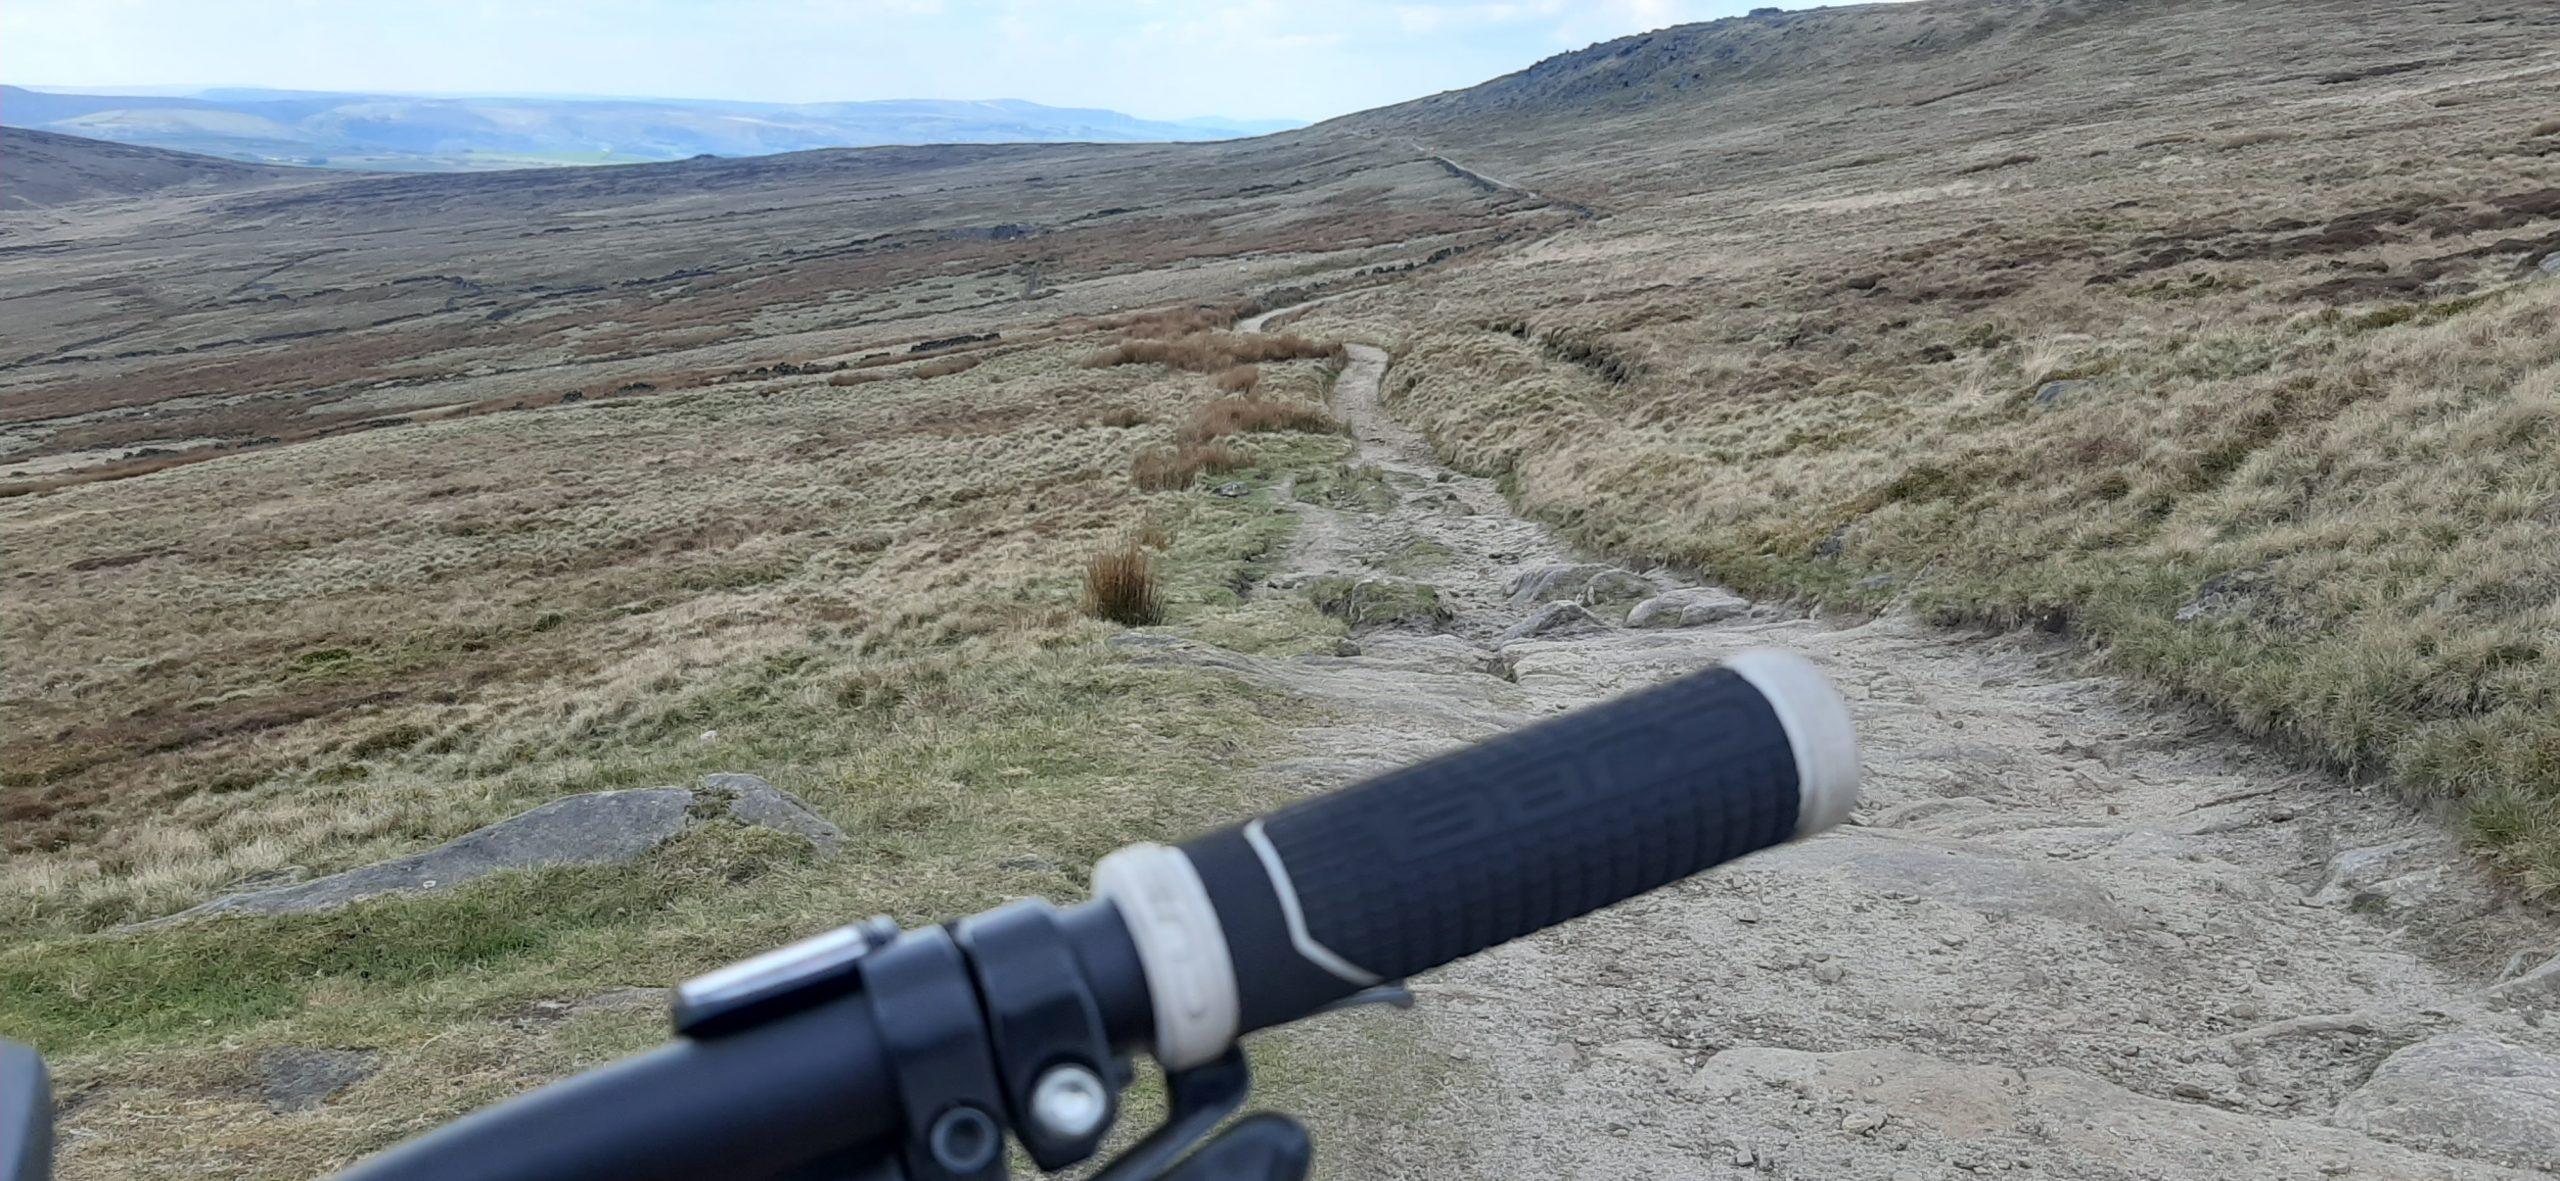 MTB, Mountain Bike Guiding, Trail Riding